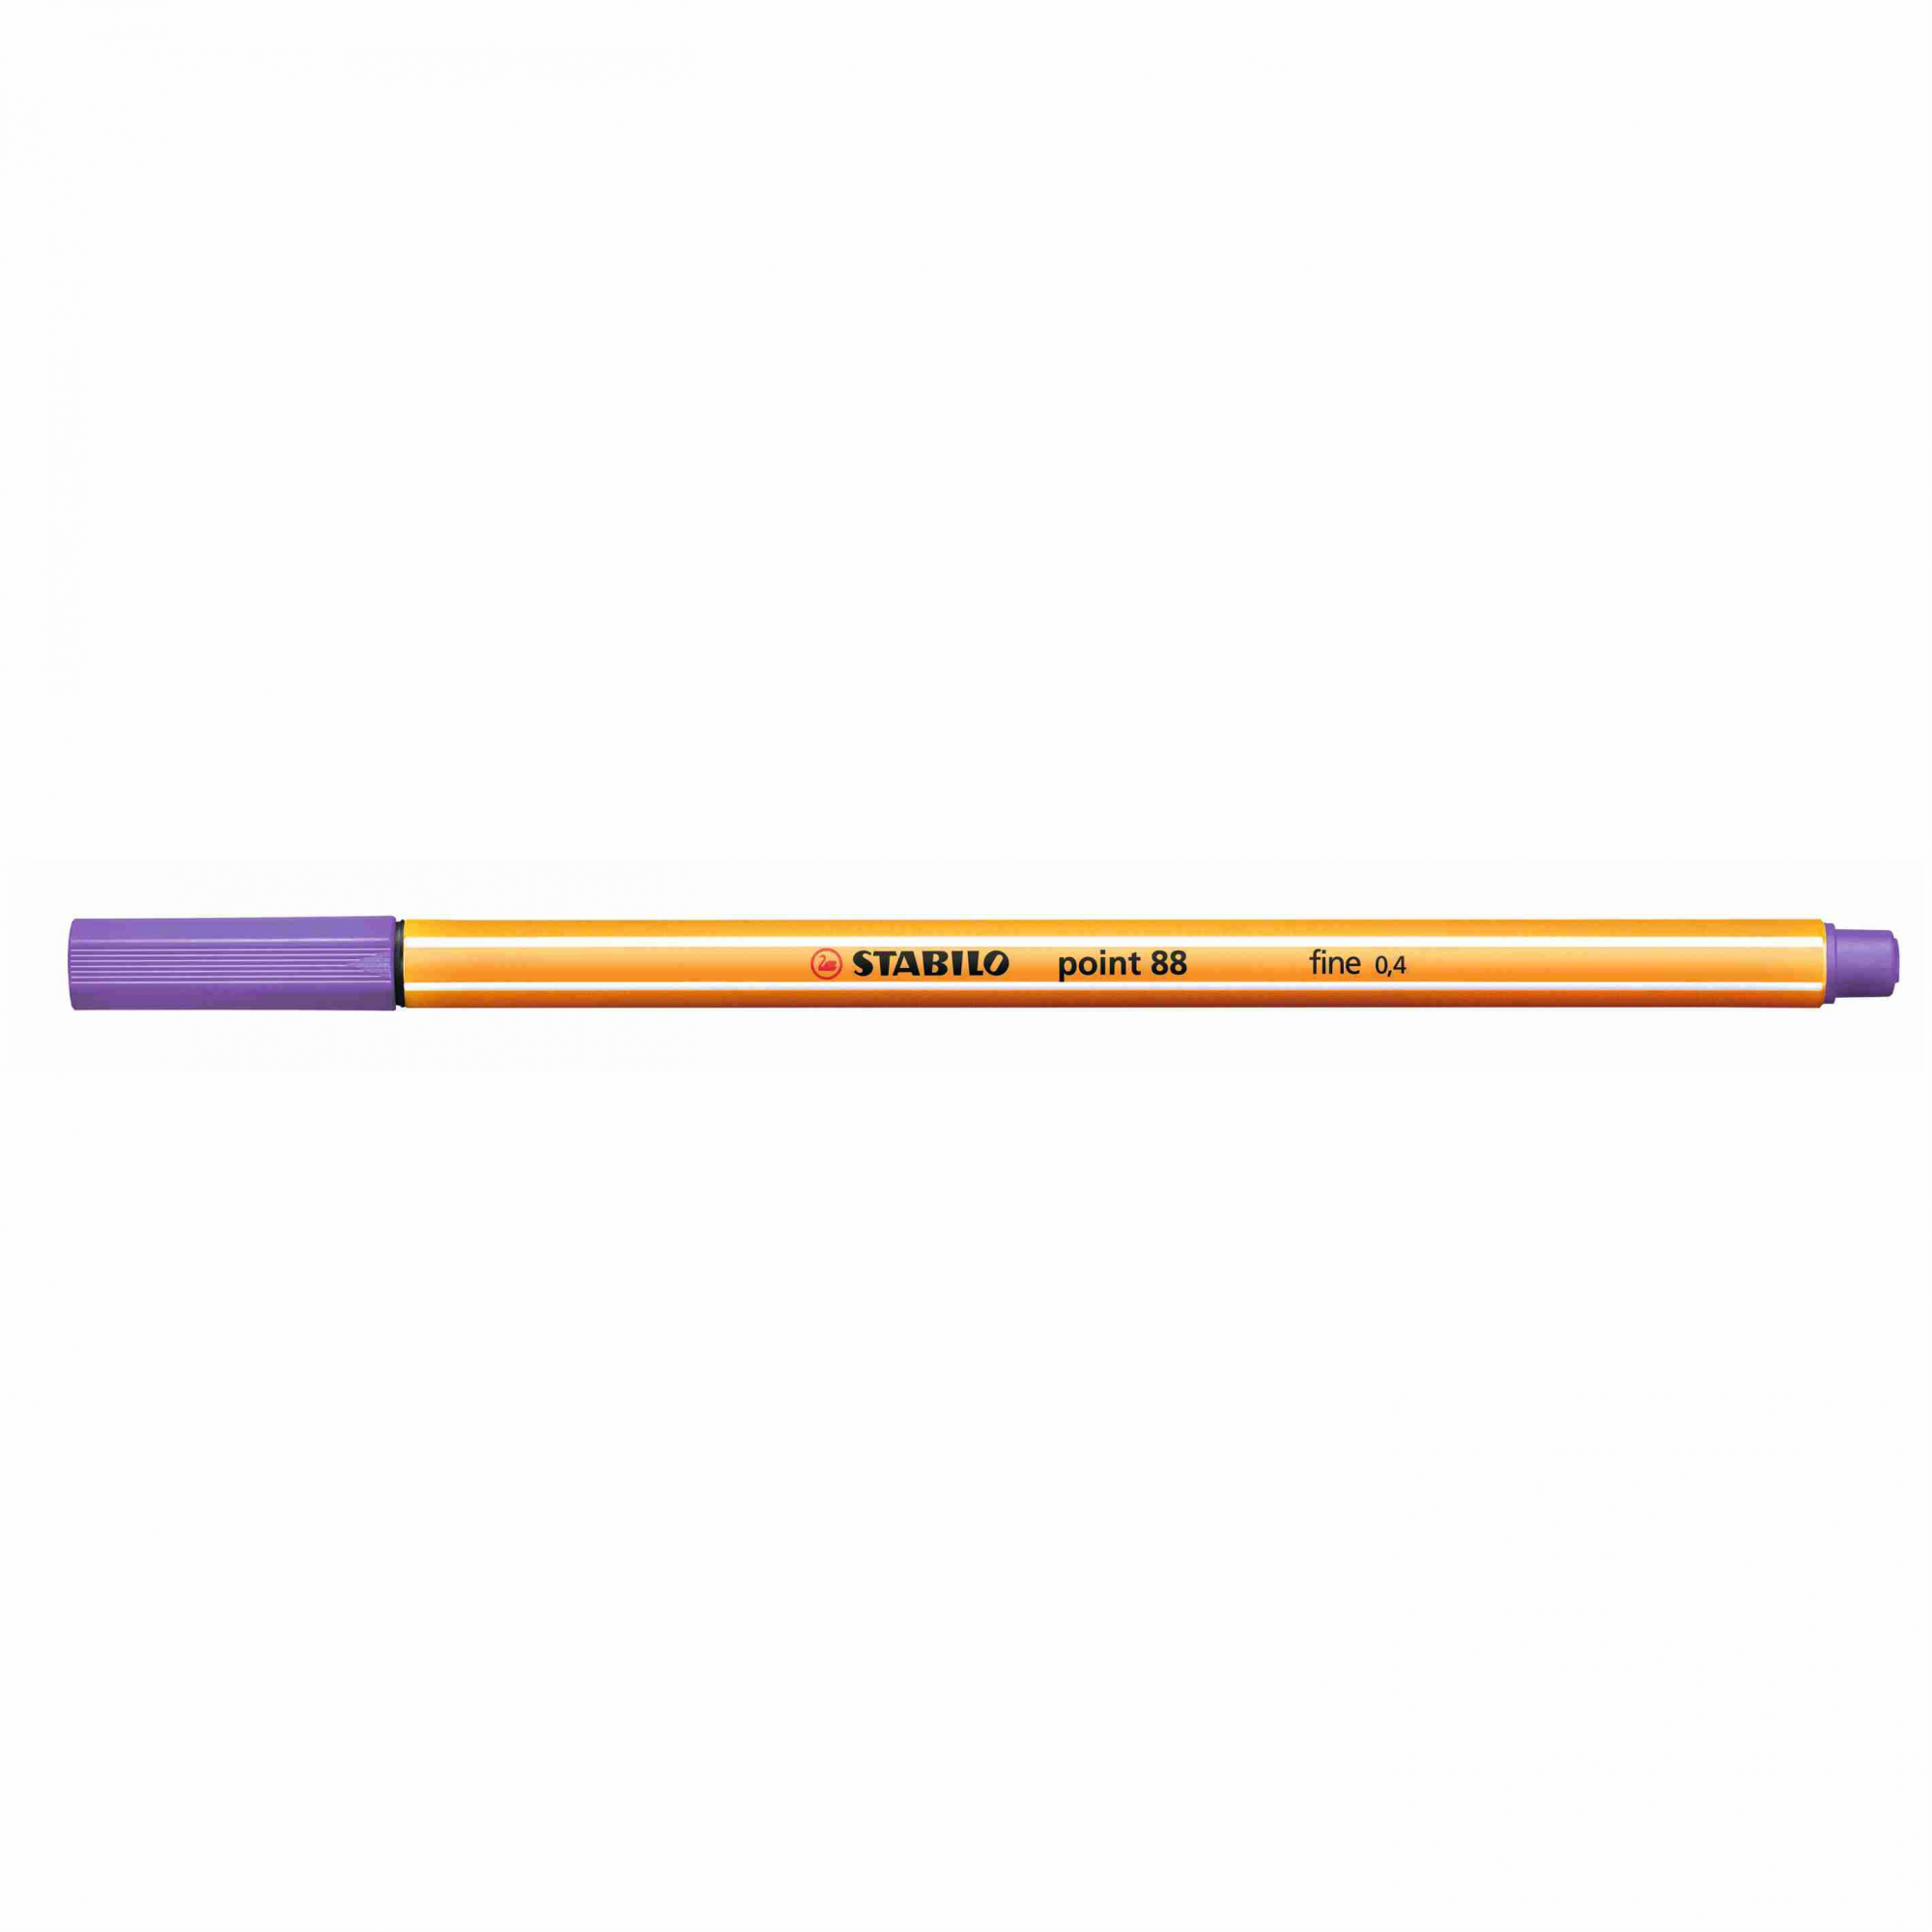 Caneta Hidrográfica 0.4 violeta POINT 88 Stabilo